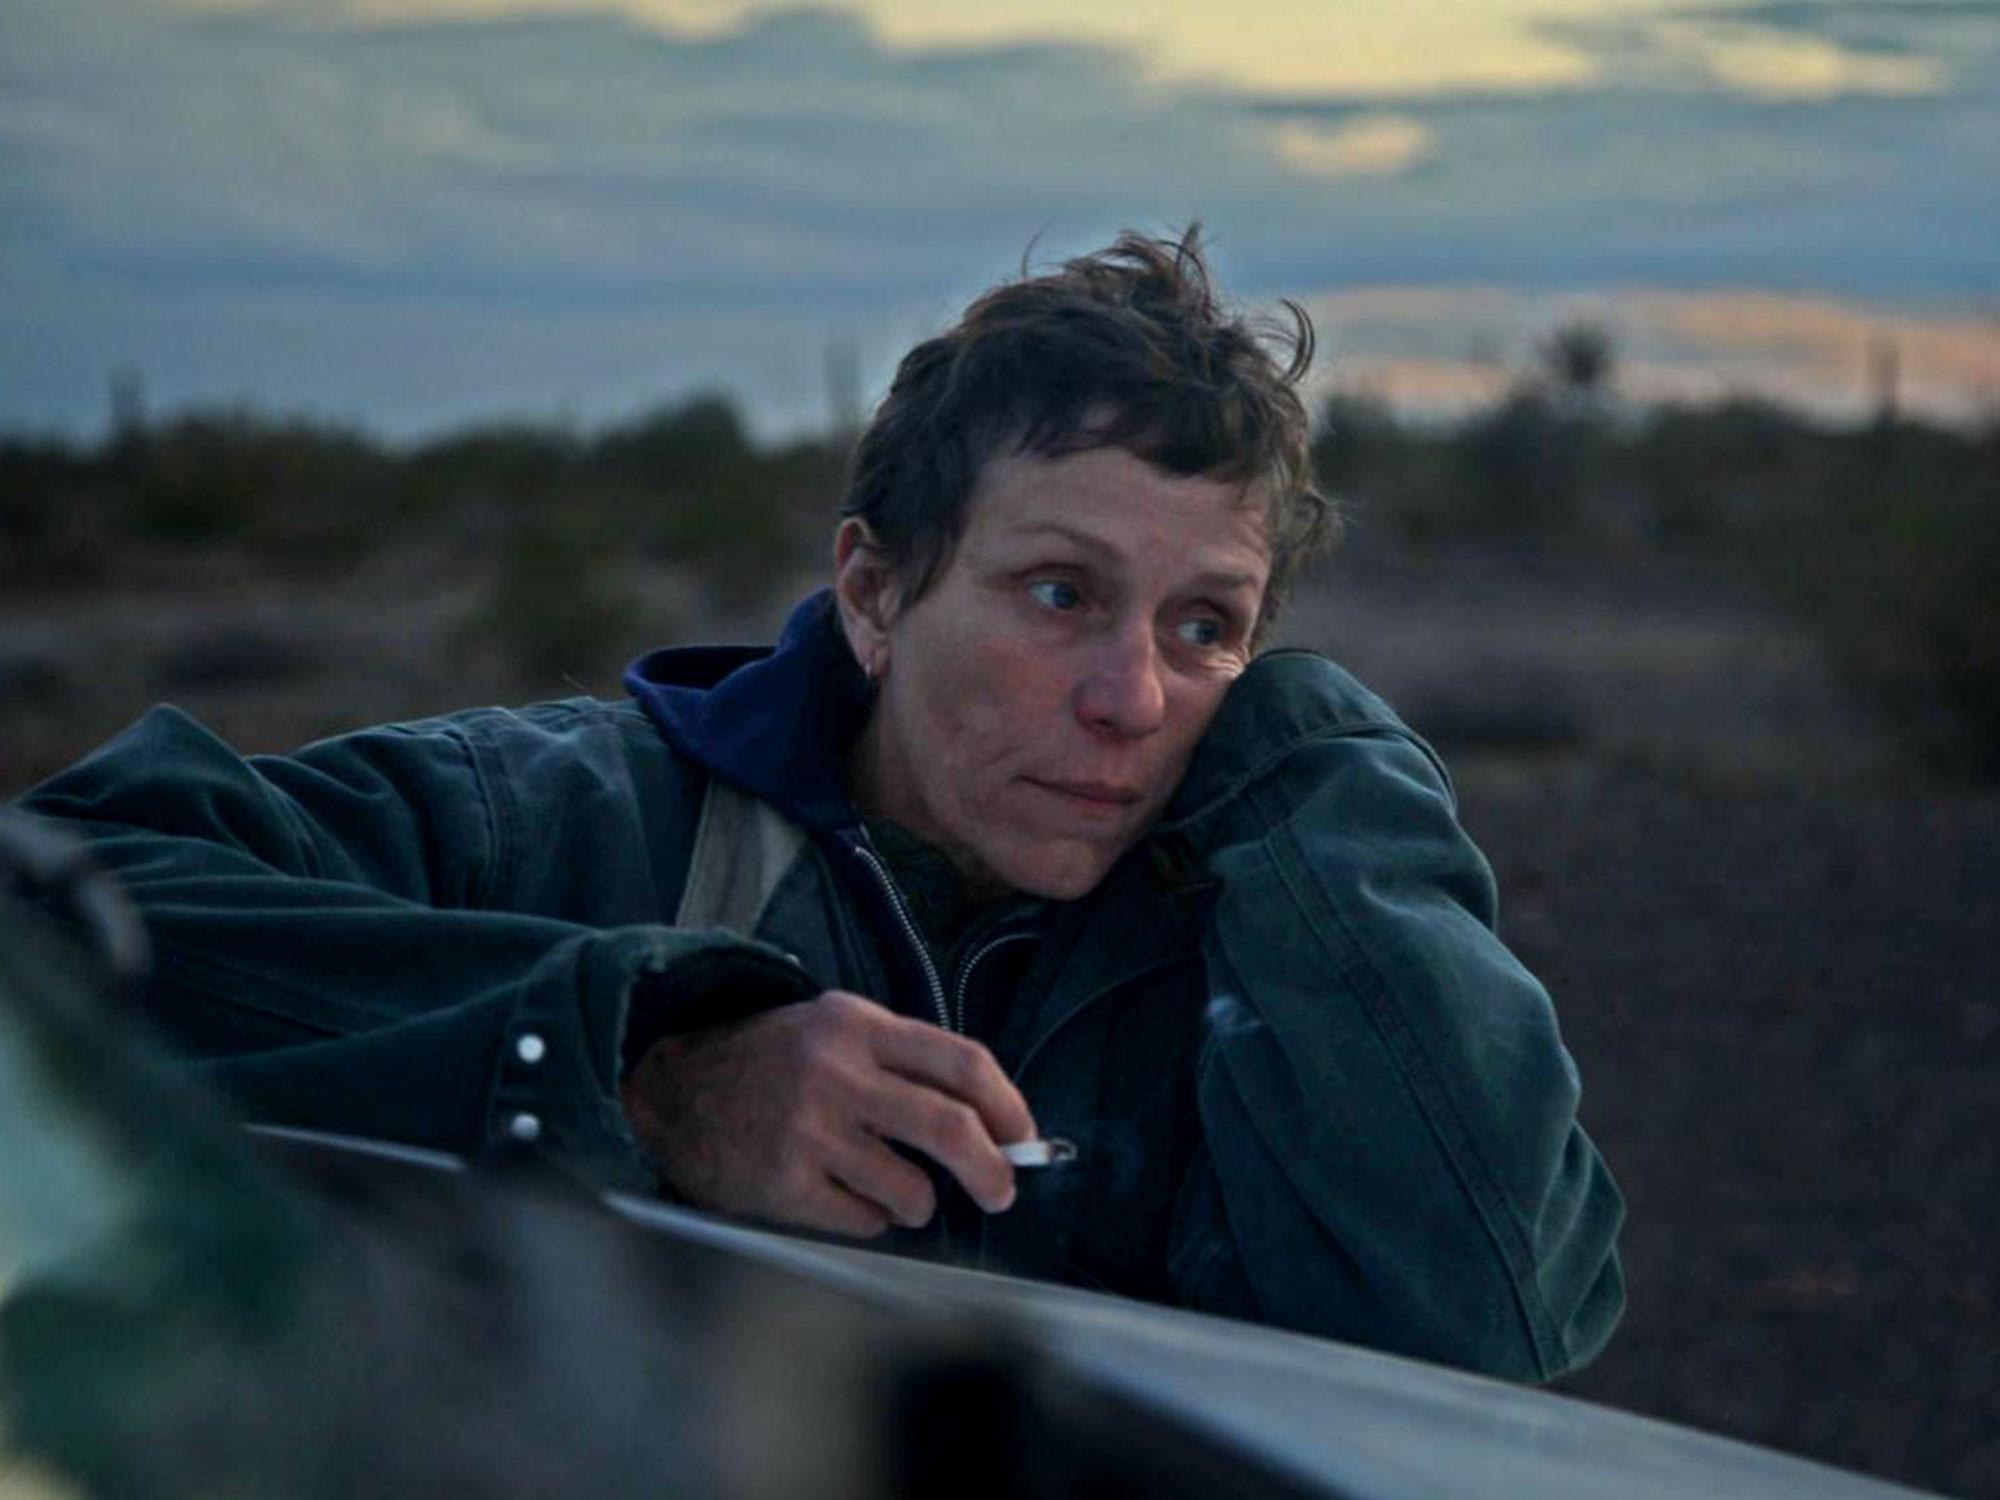 Nomadland - La recensione del film di Chloé Zhao con Frances McDormand, in  concorso a Venezia 77 | Awards Today - news, trailer, recensioni, cinema,  serie tv, oscar